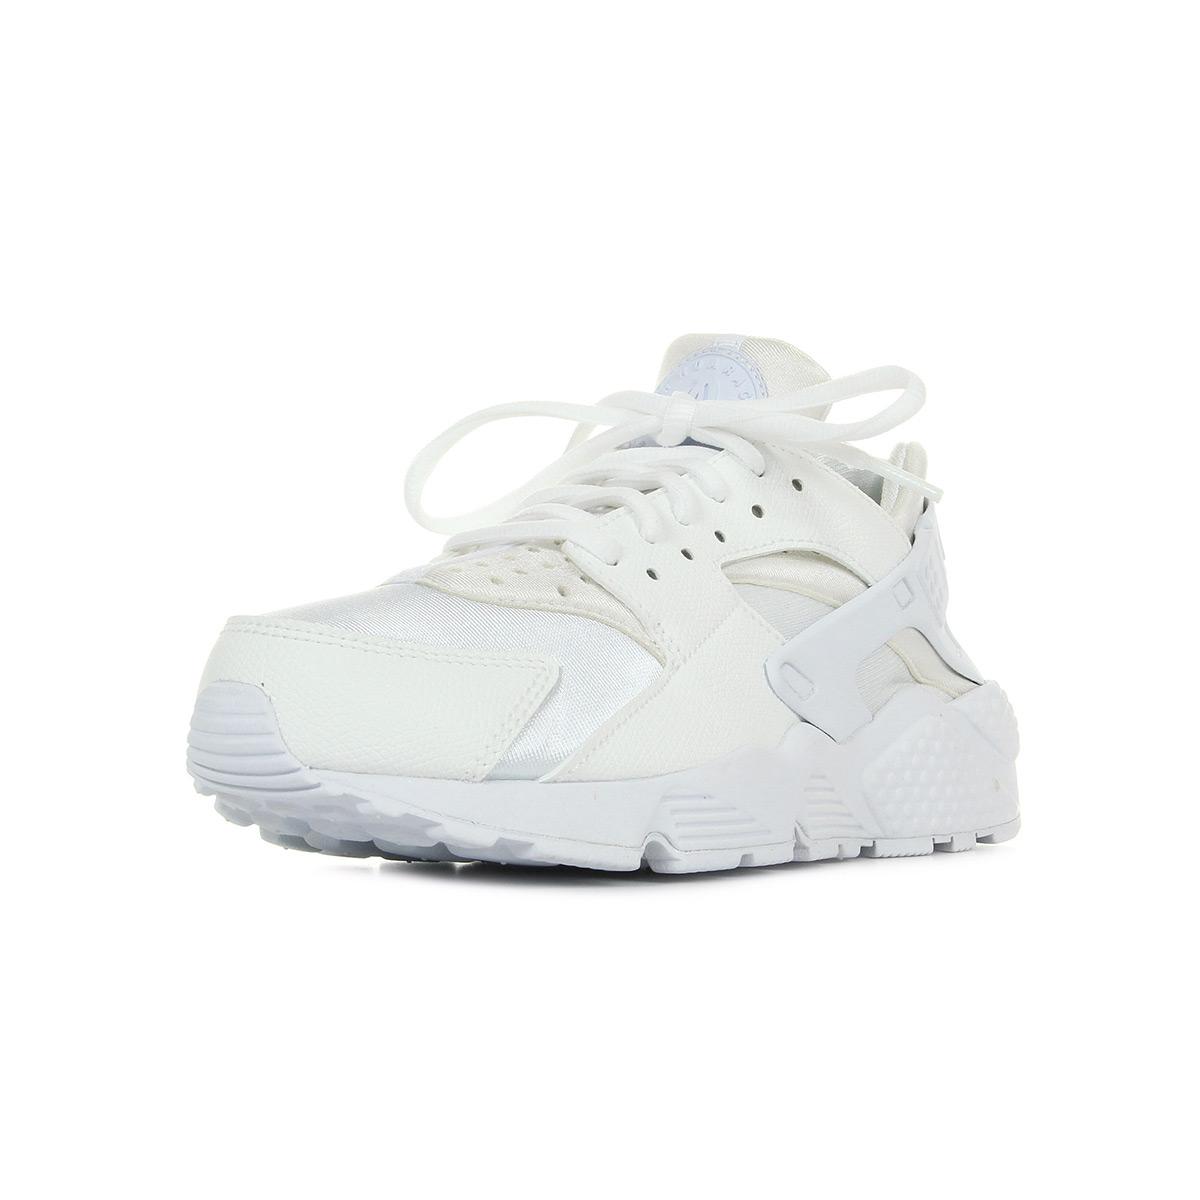 Mode 634835108Baskets Run Femme Nike Huarache vPn0ym8NwO